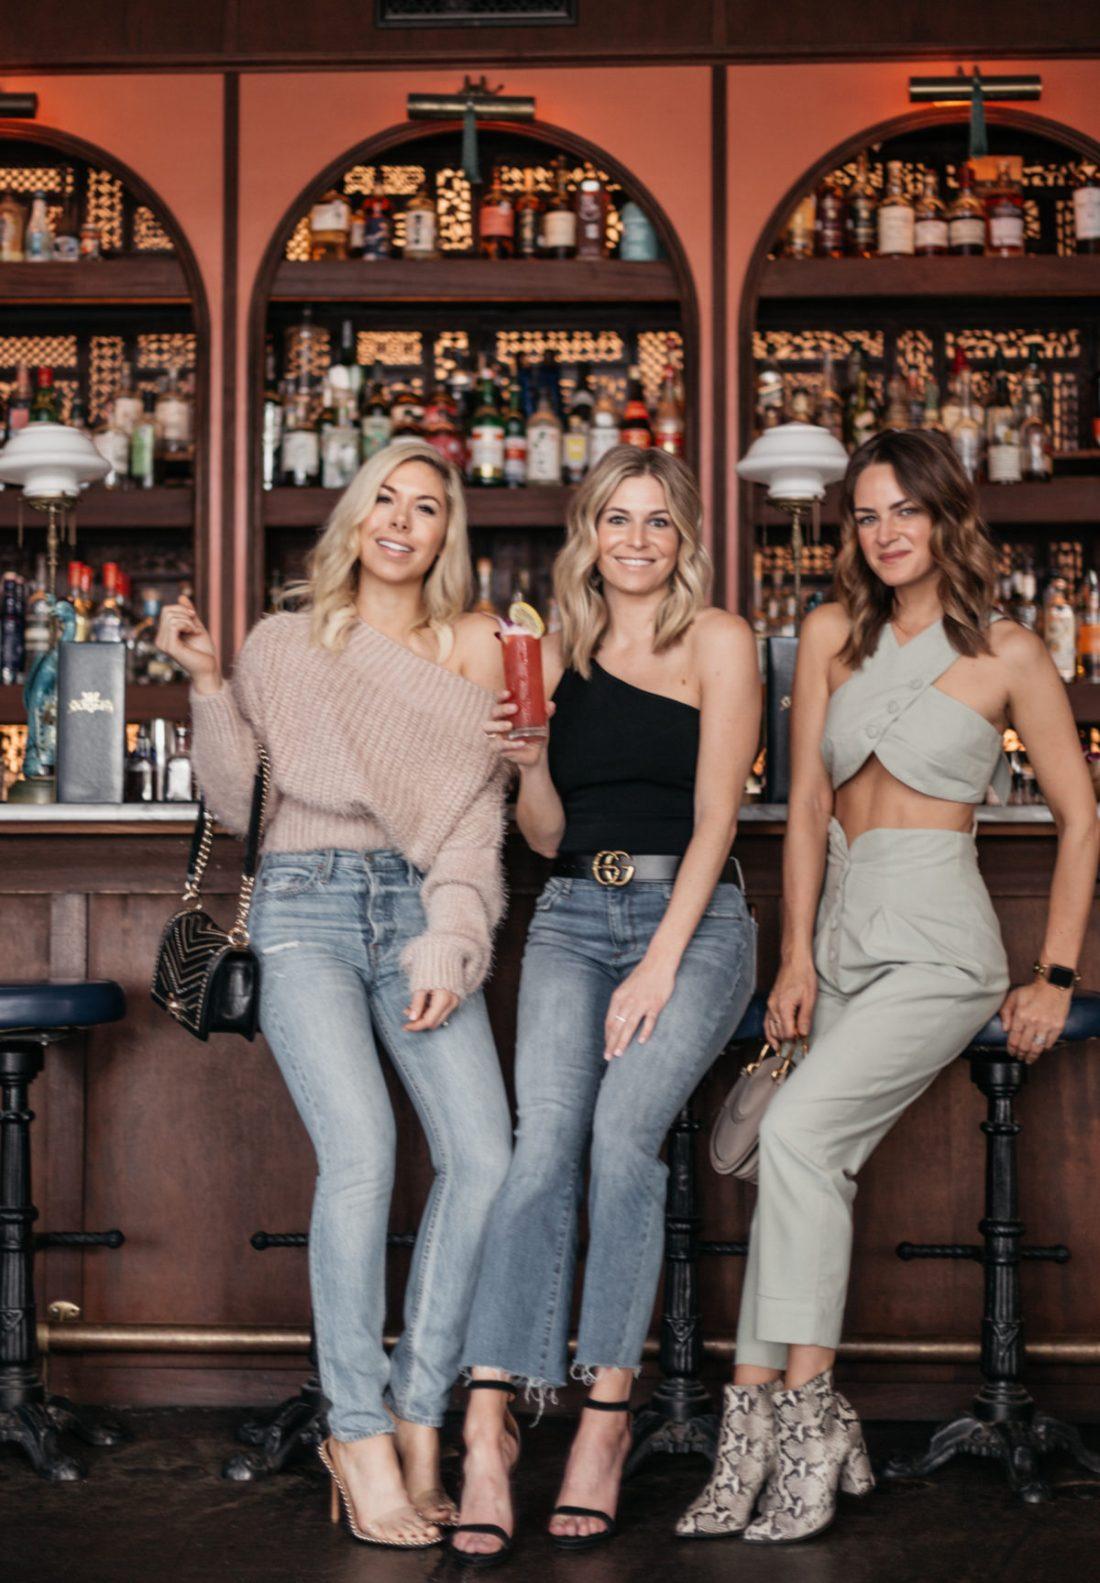 Brooke Burnett and her friends in Austin